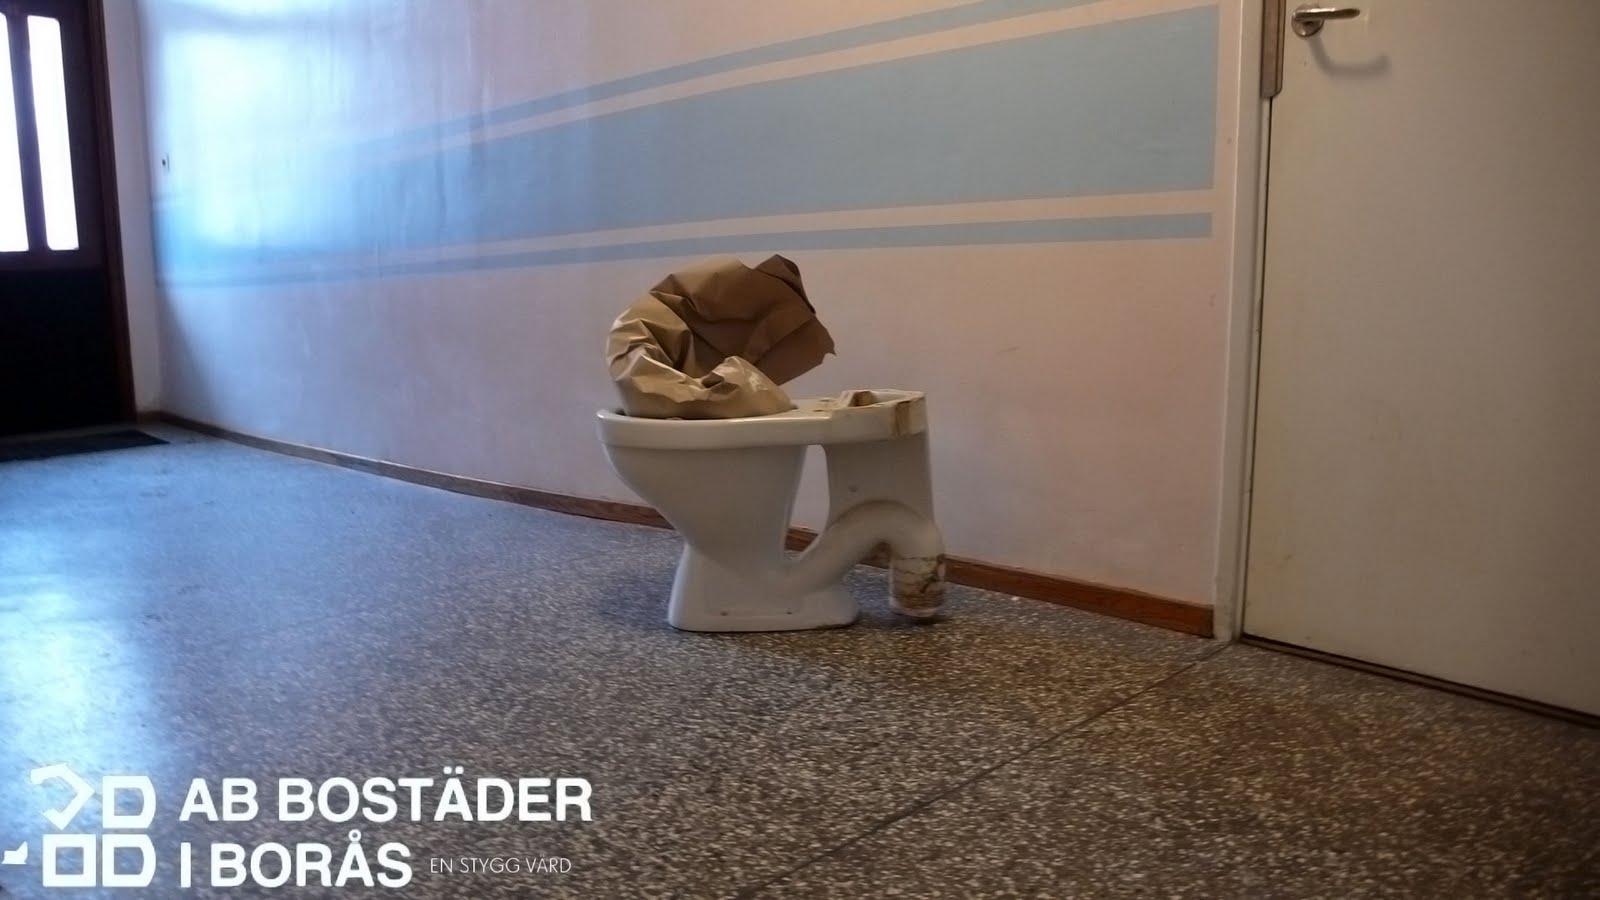 AB Bostäder i Borås Toalettstol